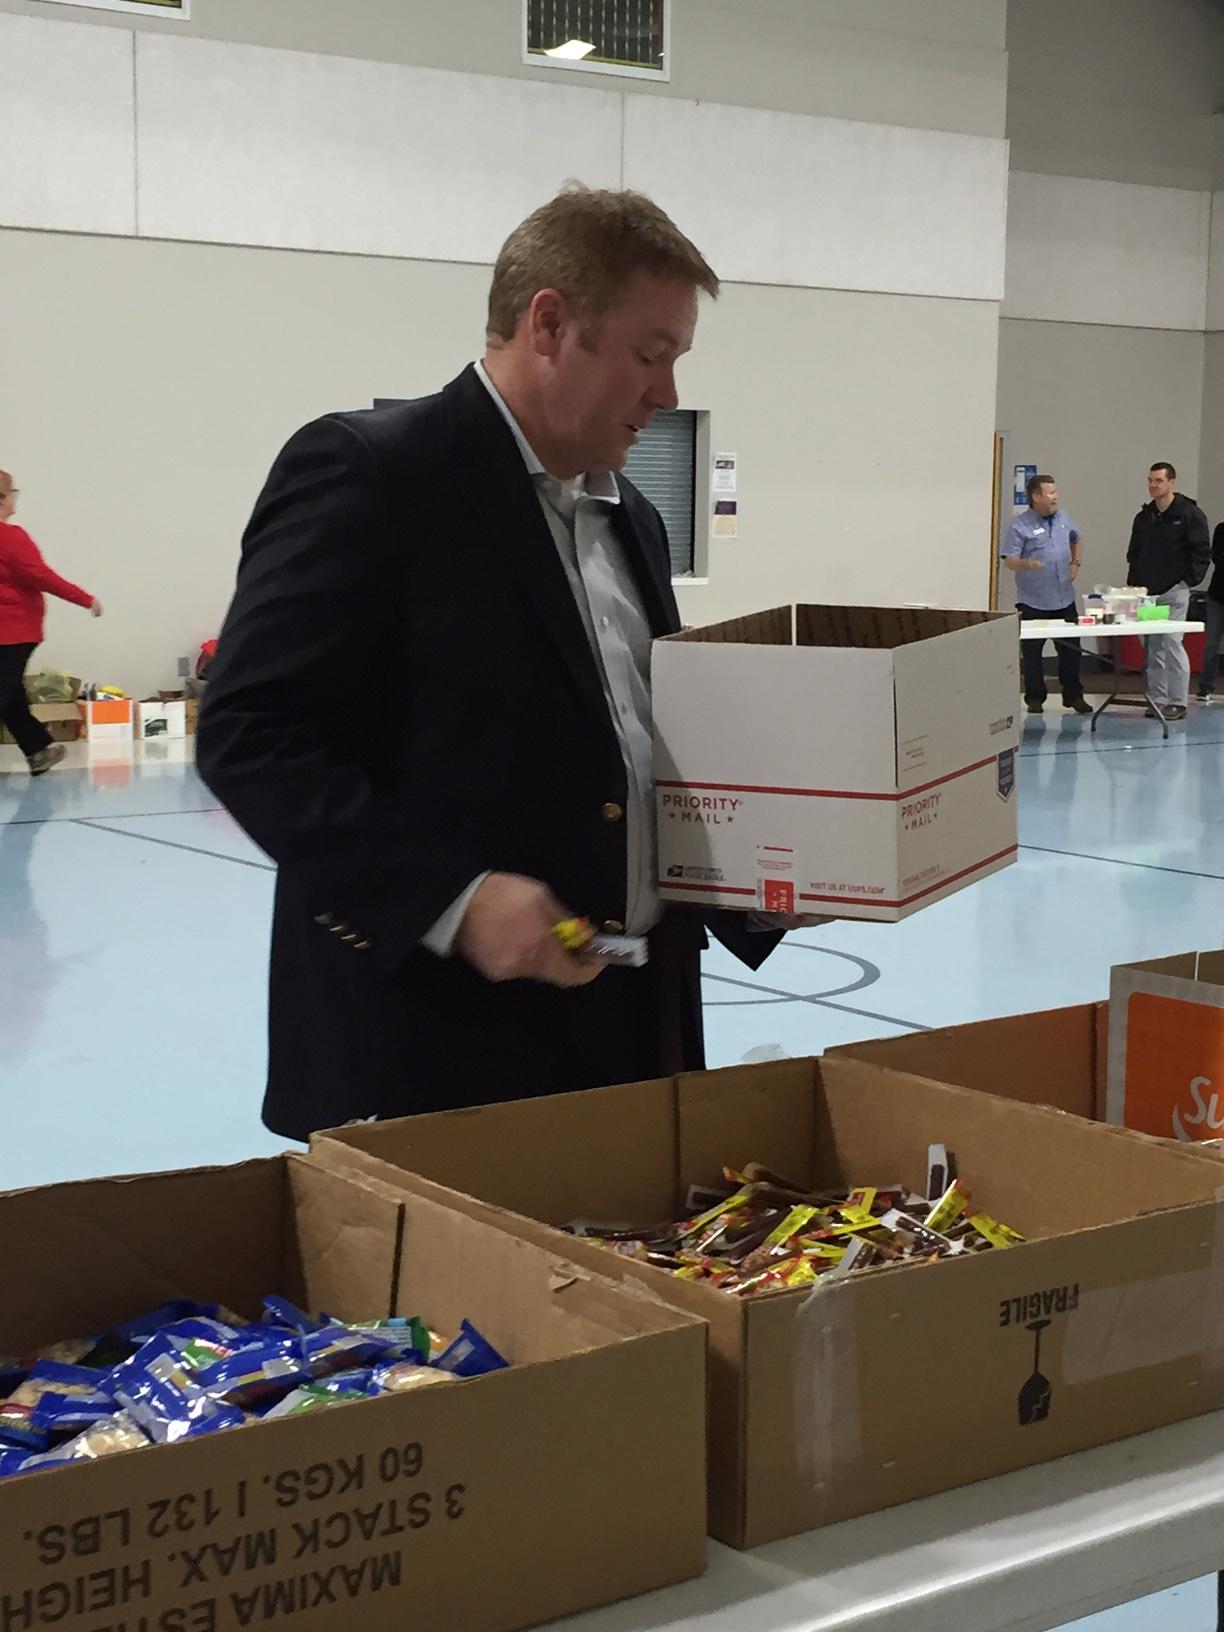 TVS CBI Students help Blue Star Moms pack food.